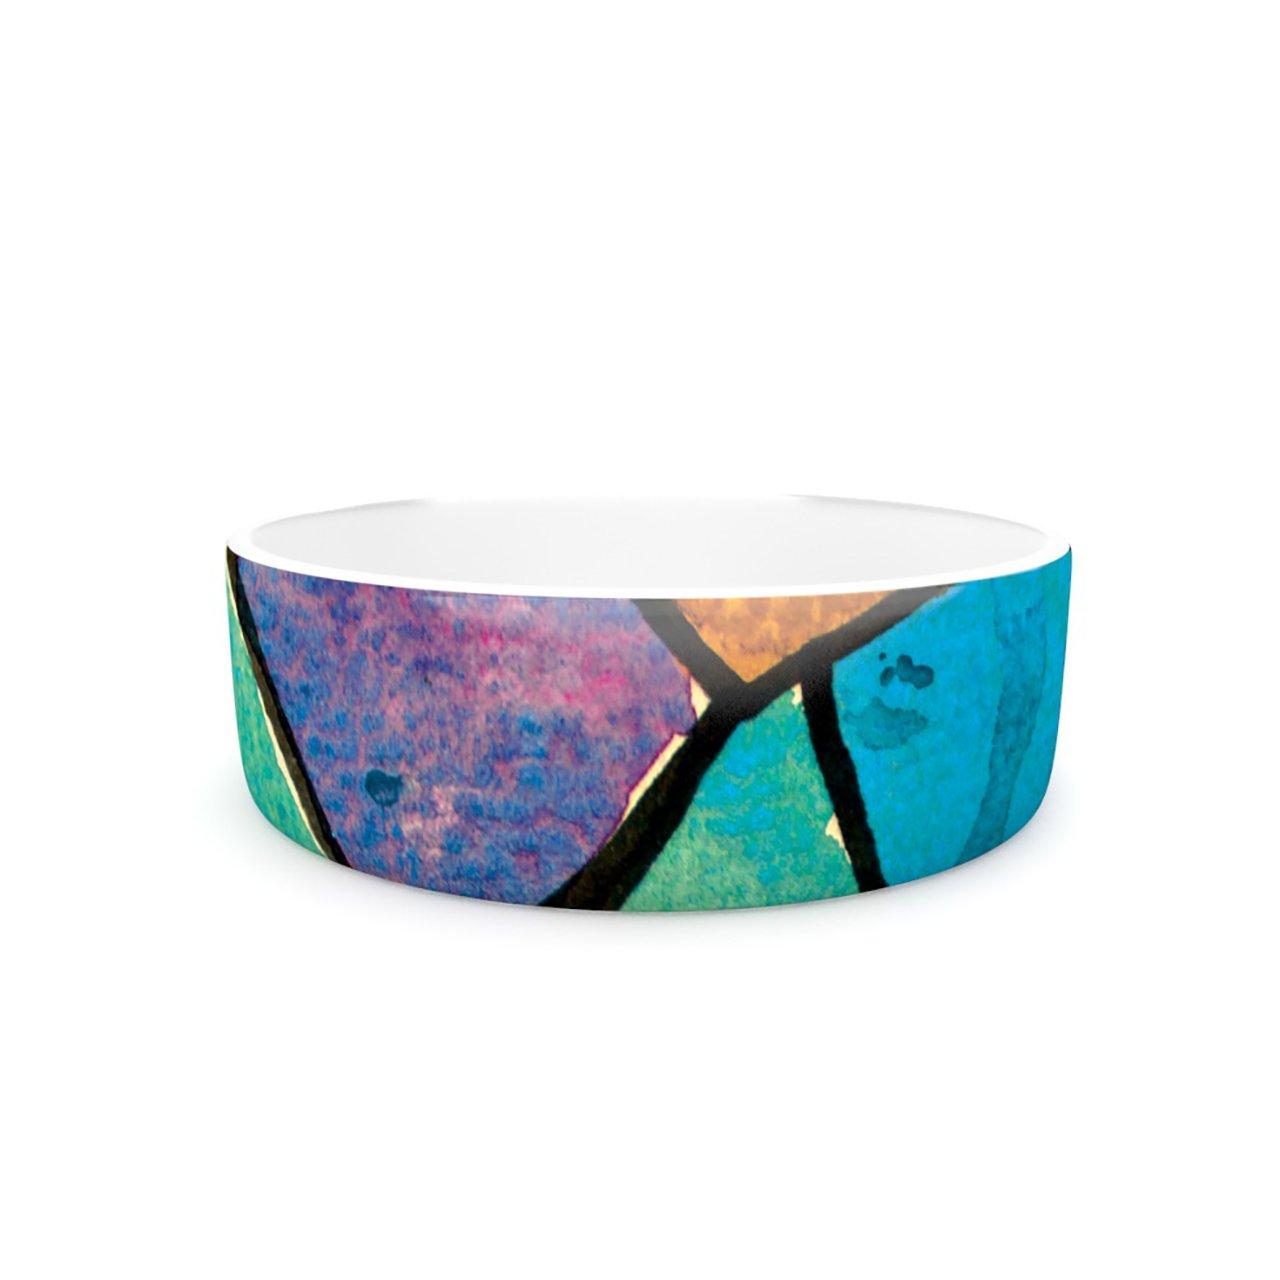 Kess InHouse Theresa Giolzetti Stain Glass 2  Pet Bowl, 7-Inch